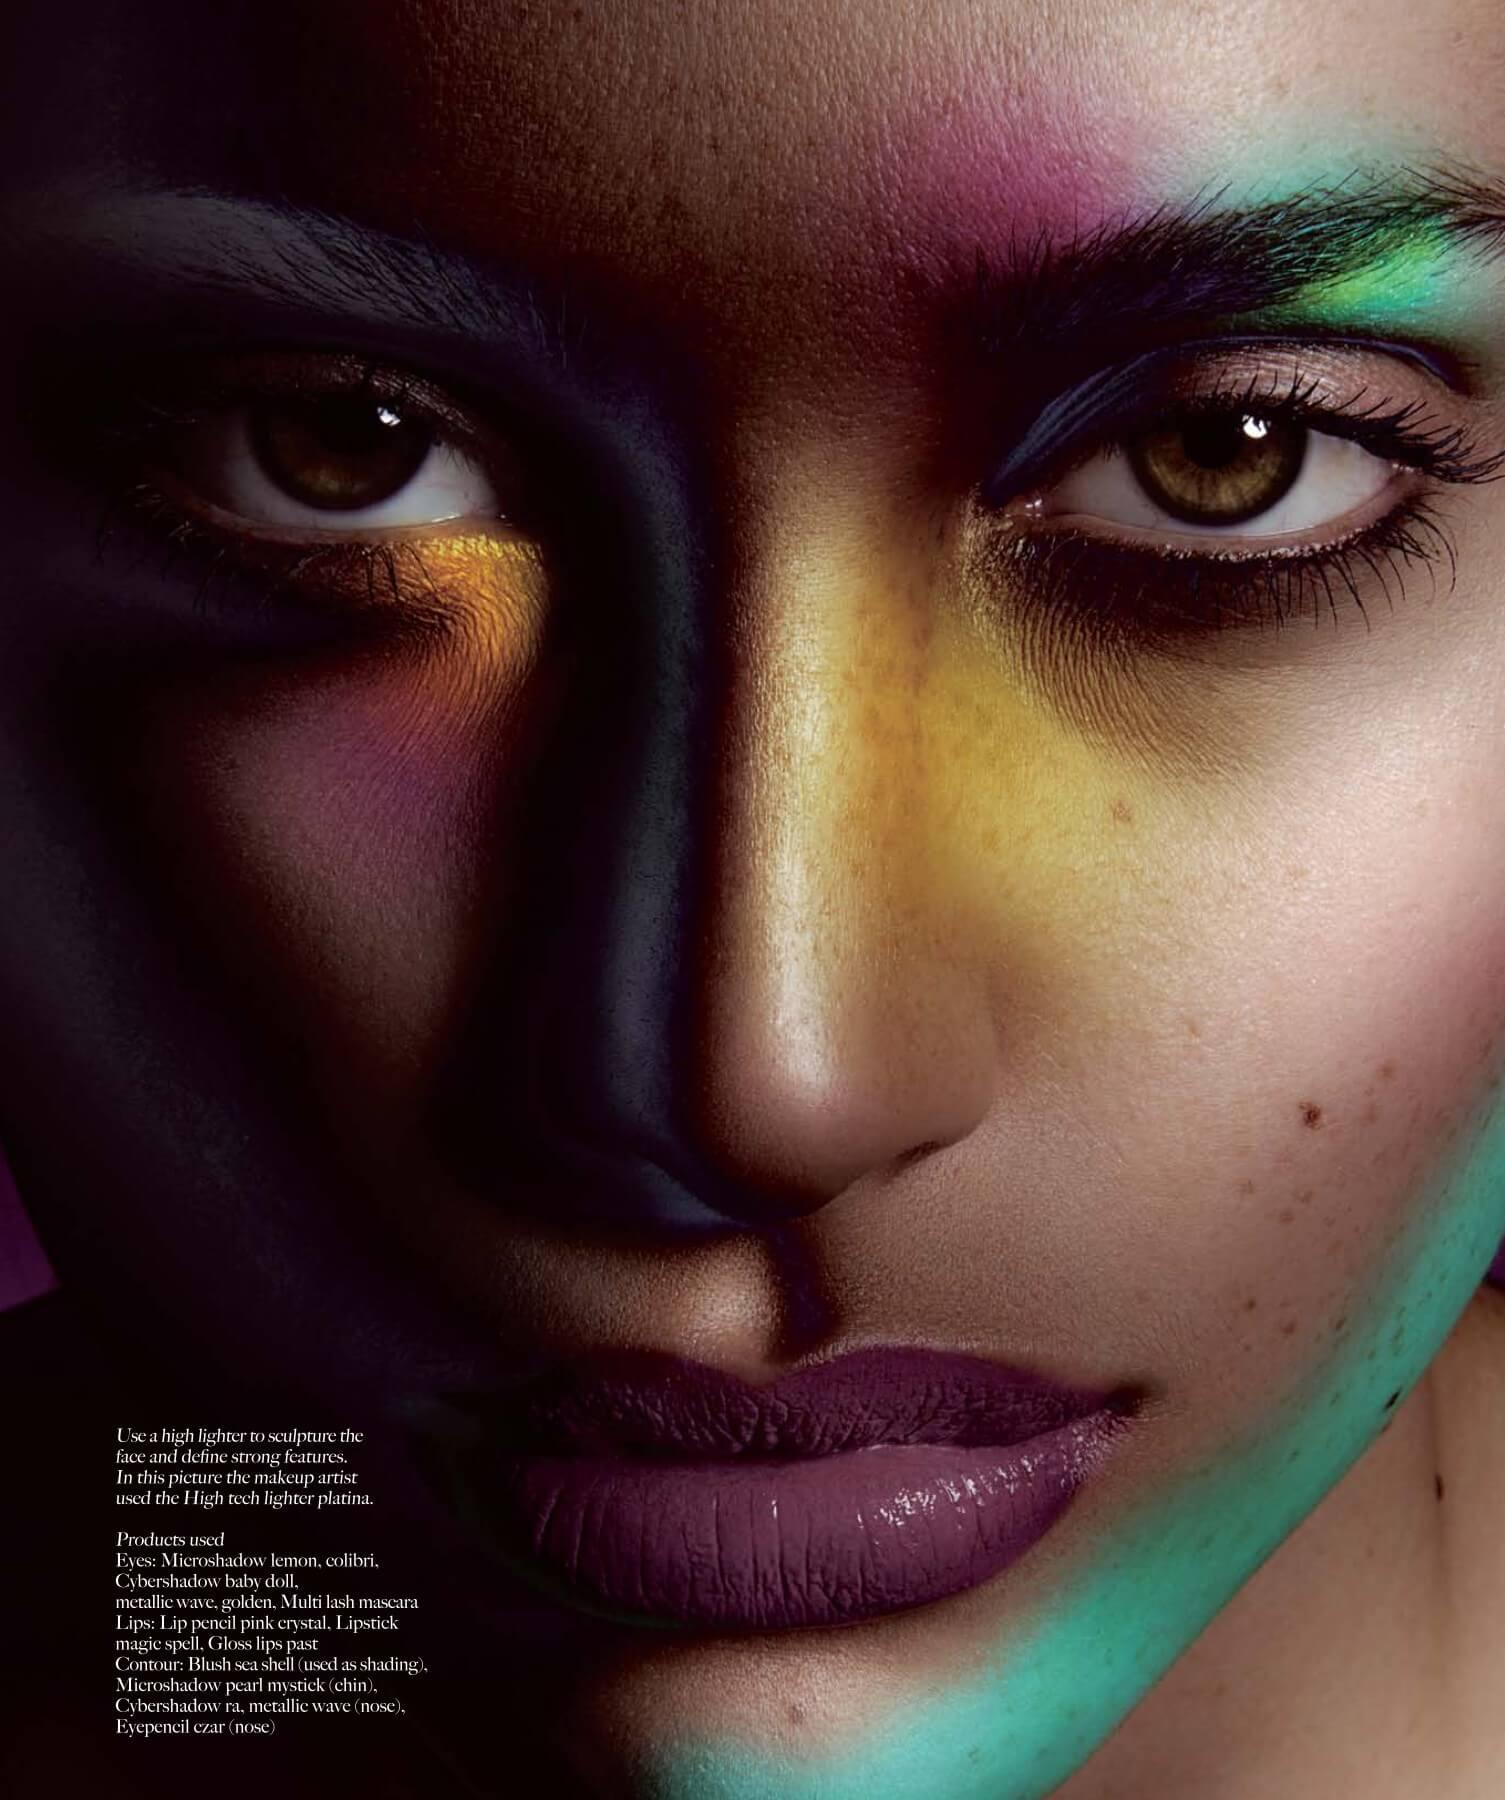 Maquiagem Artística: Editorial de Beleza